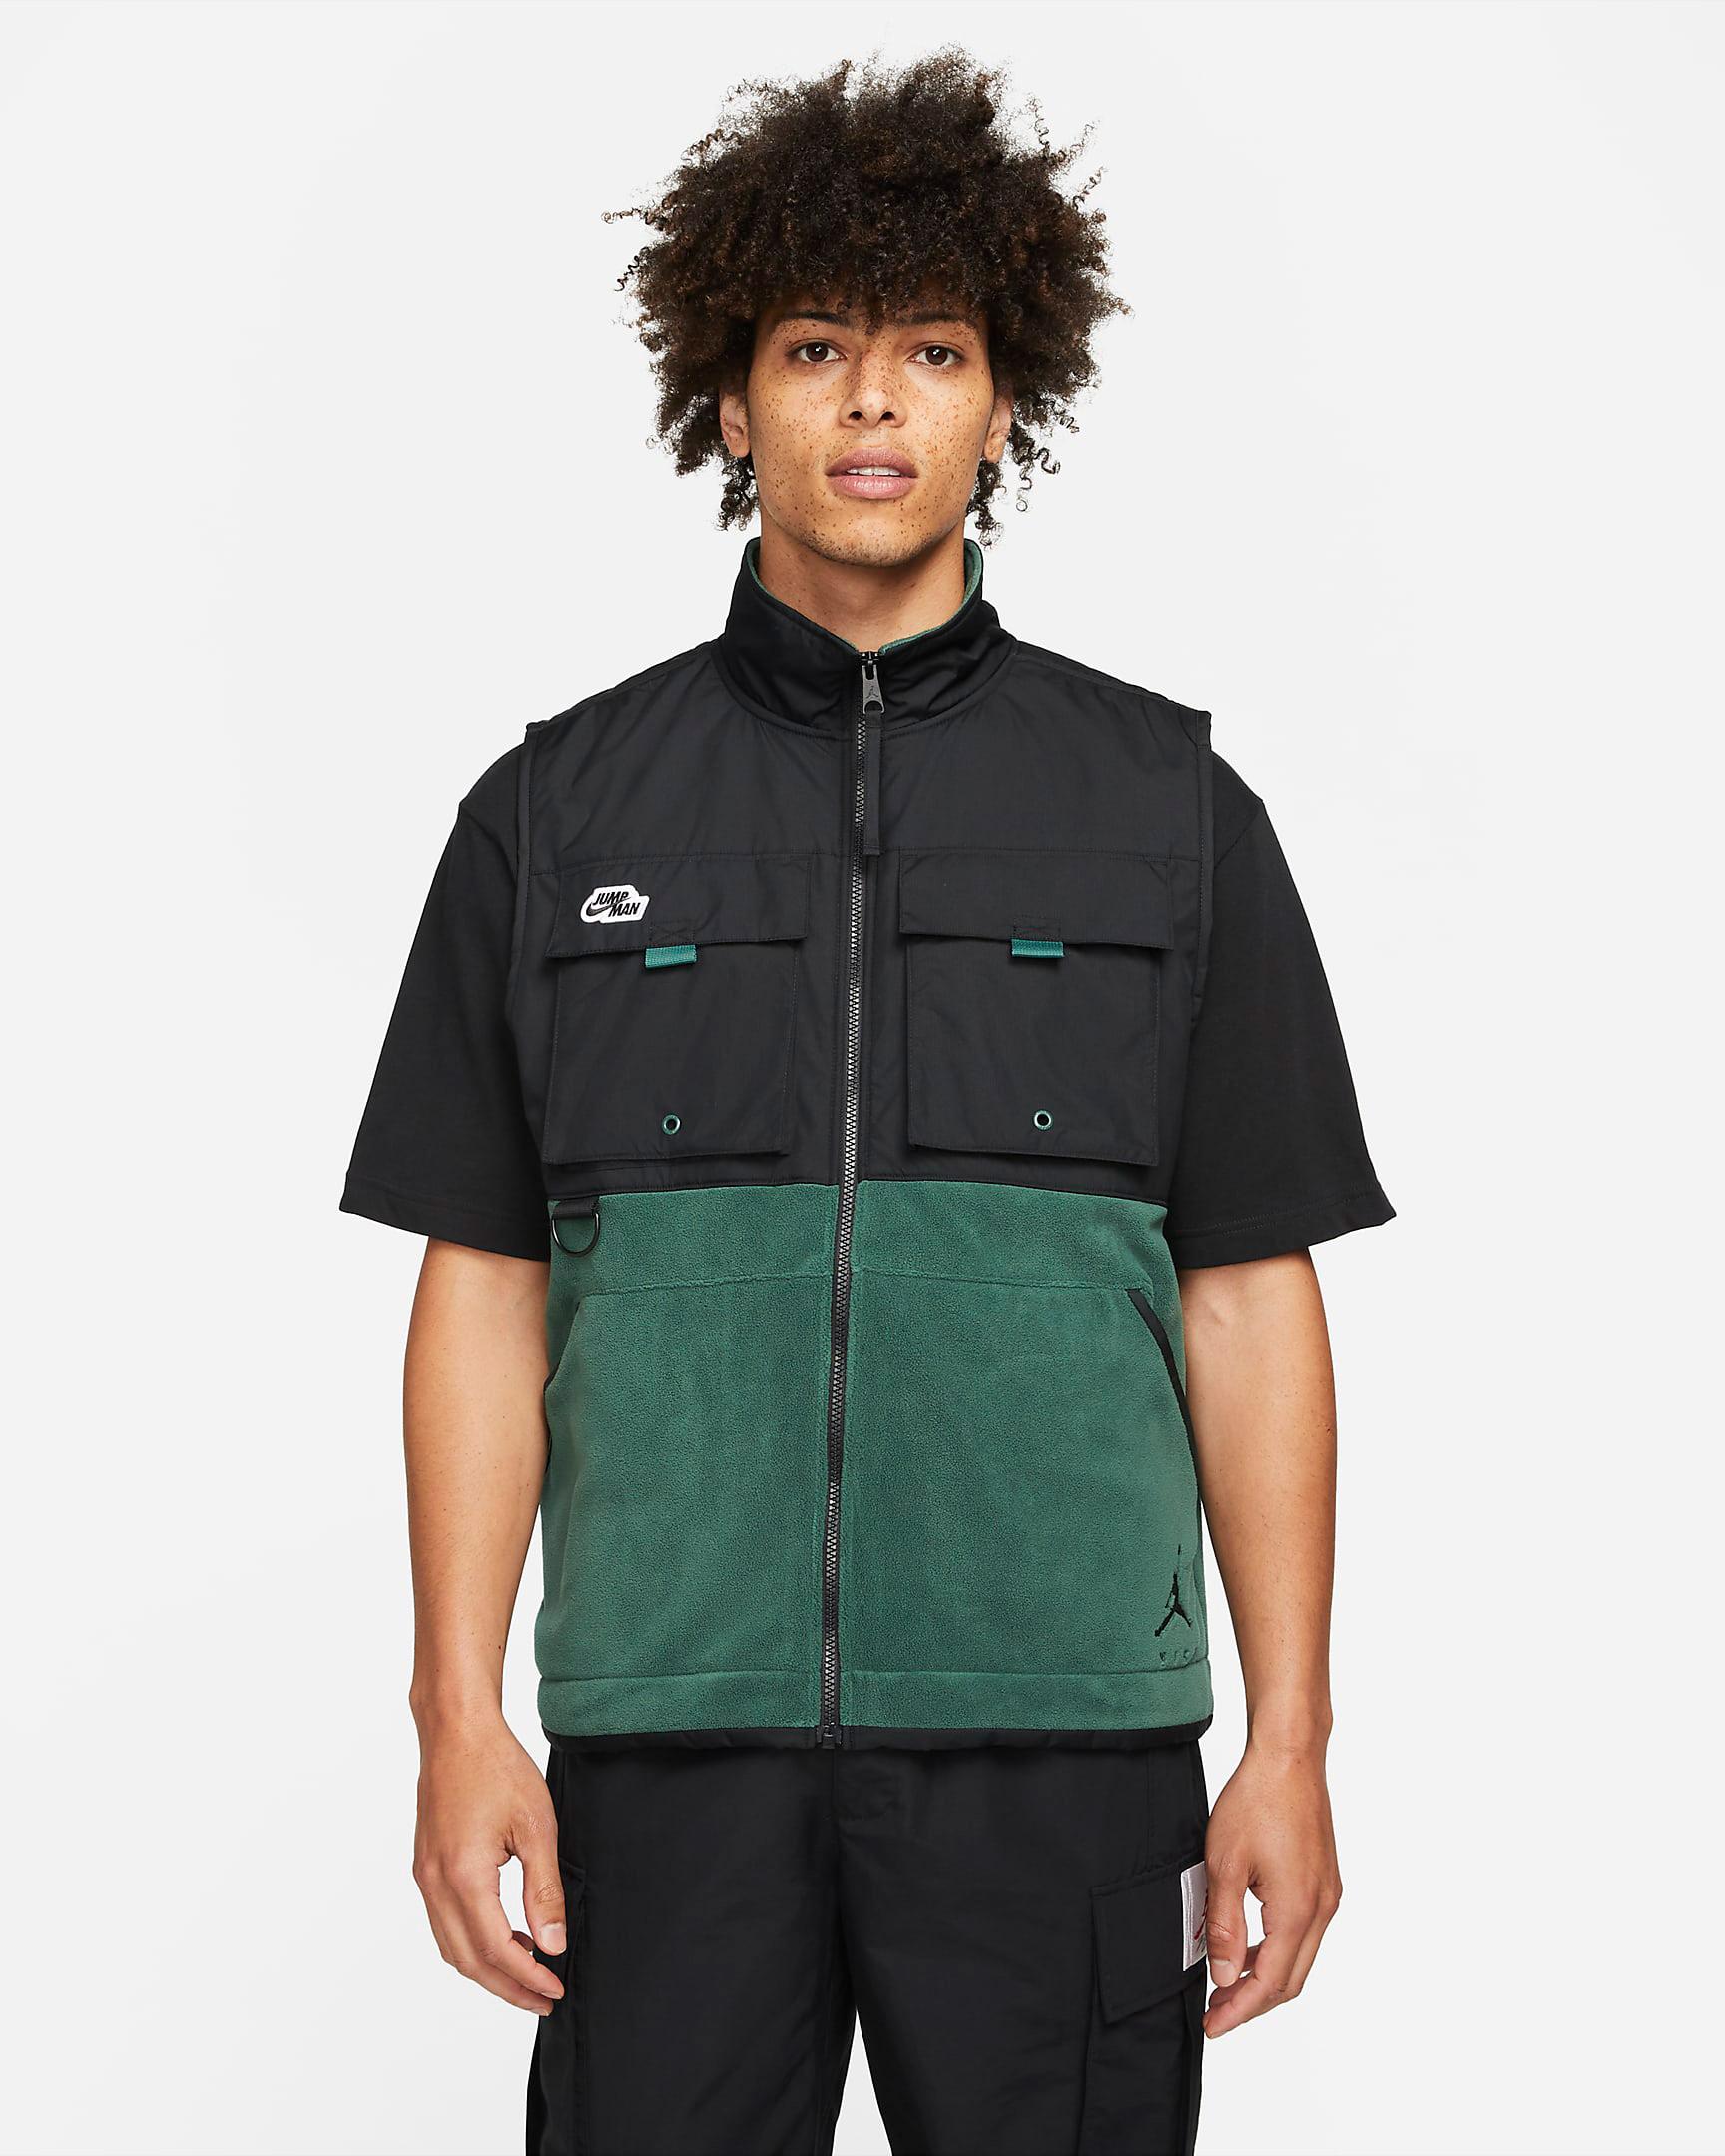 jordan-noble-green-black-jumpman-vest-1